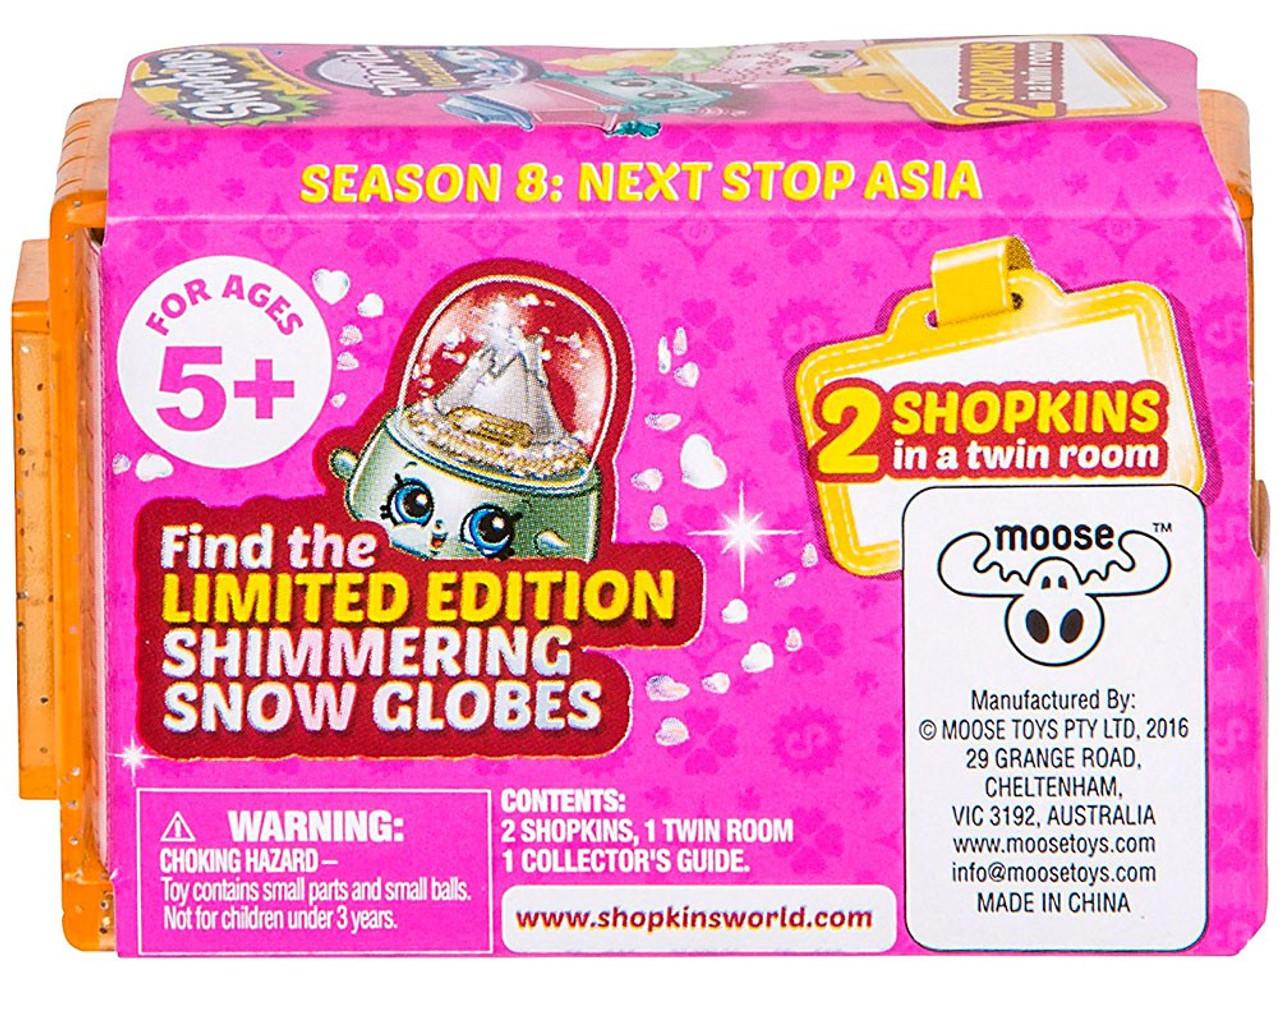 Shopkins Collectors Guide